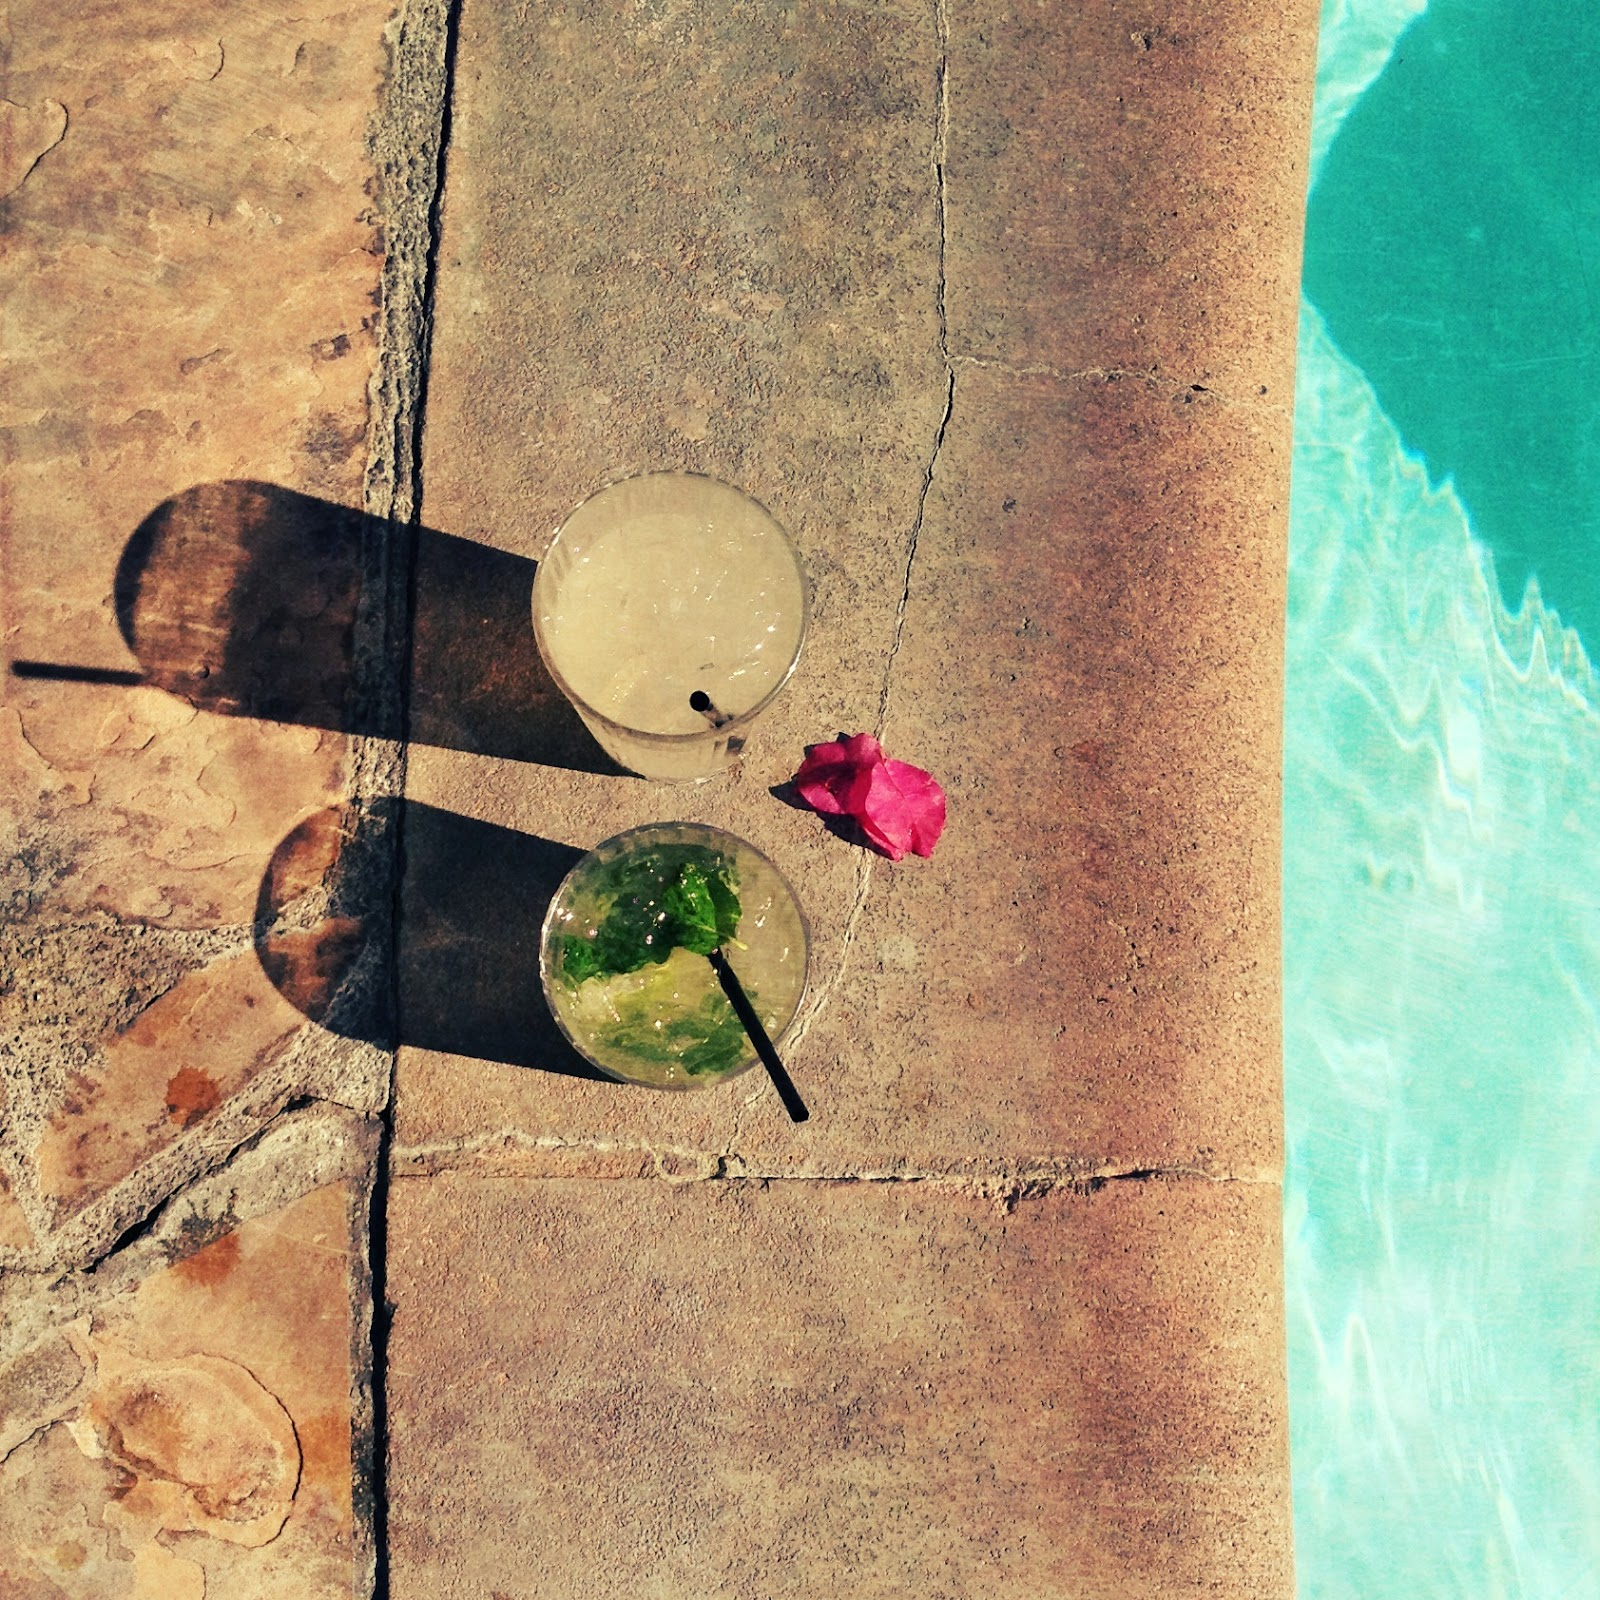 viceroy hotel palm springs, pool, summer